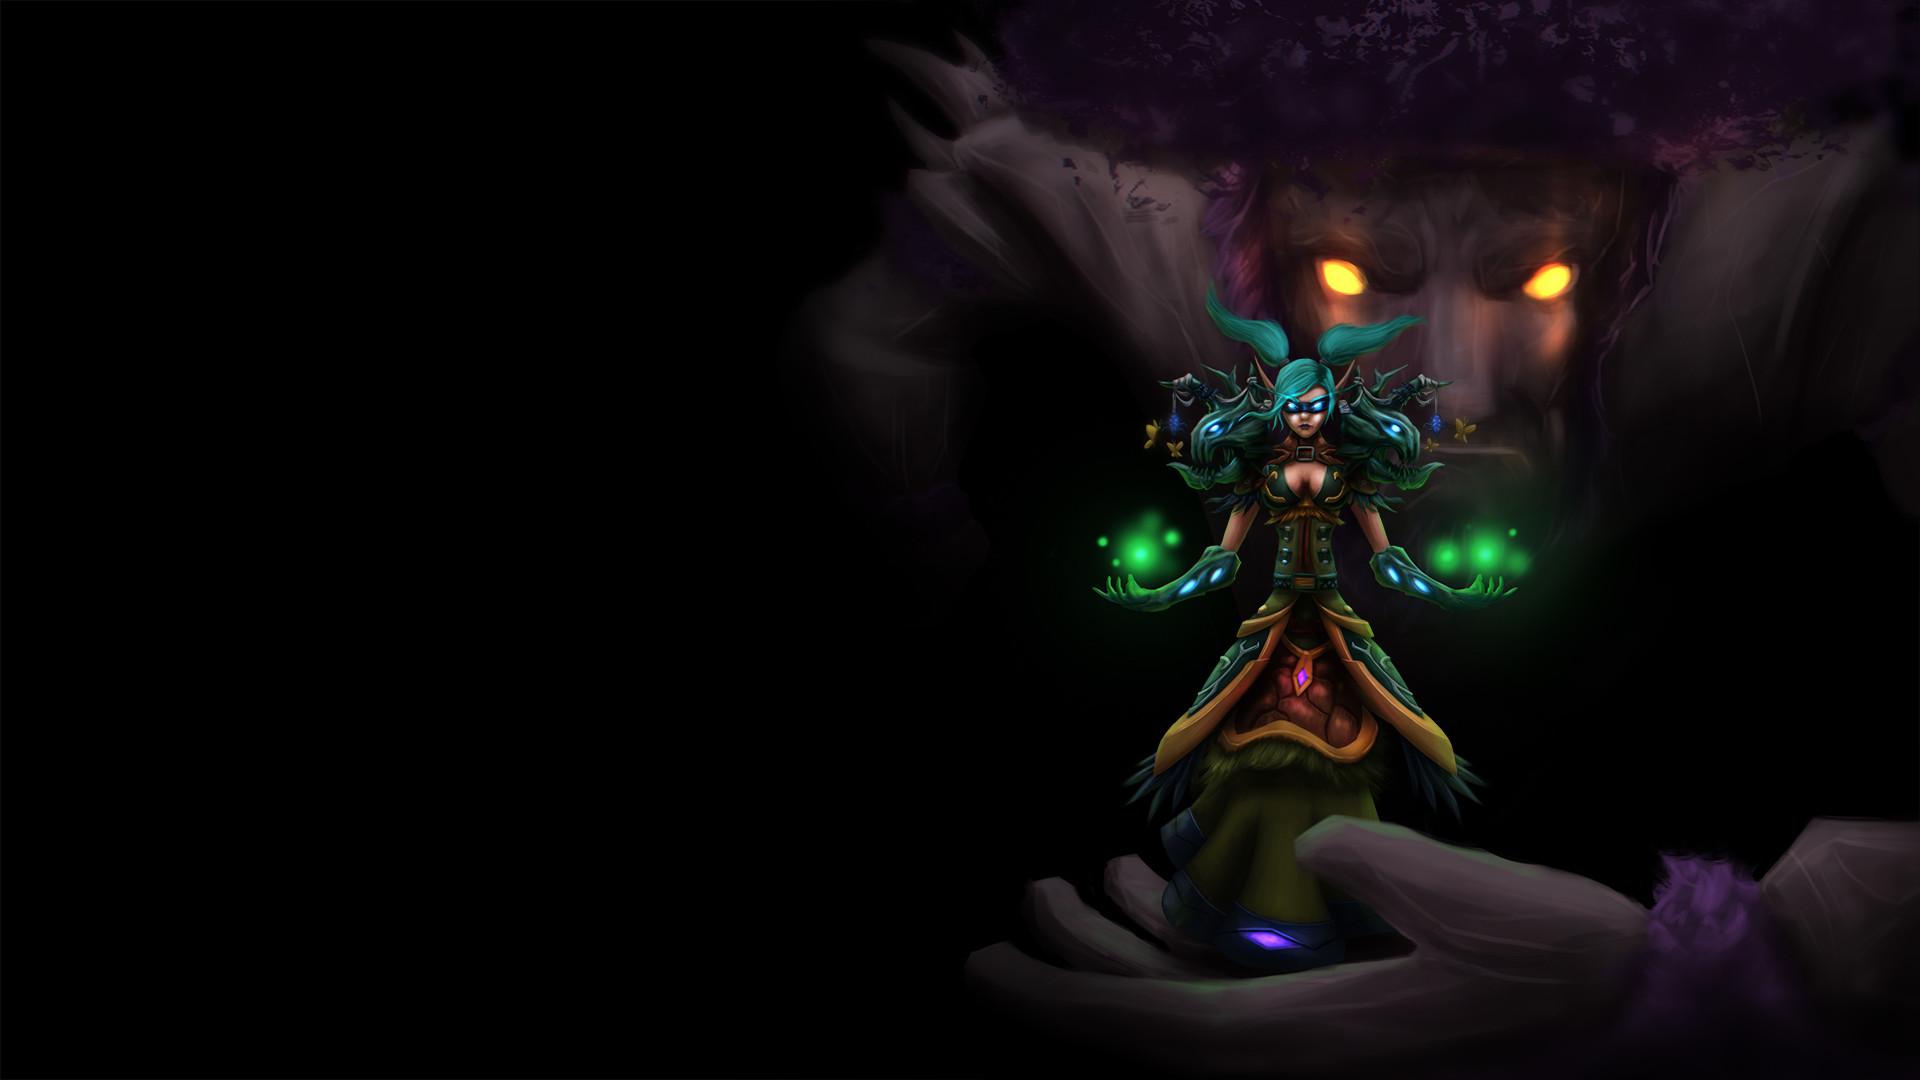 Res: 1920x1080, ... World of Warcraft - Resto Druid by oShaddixo